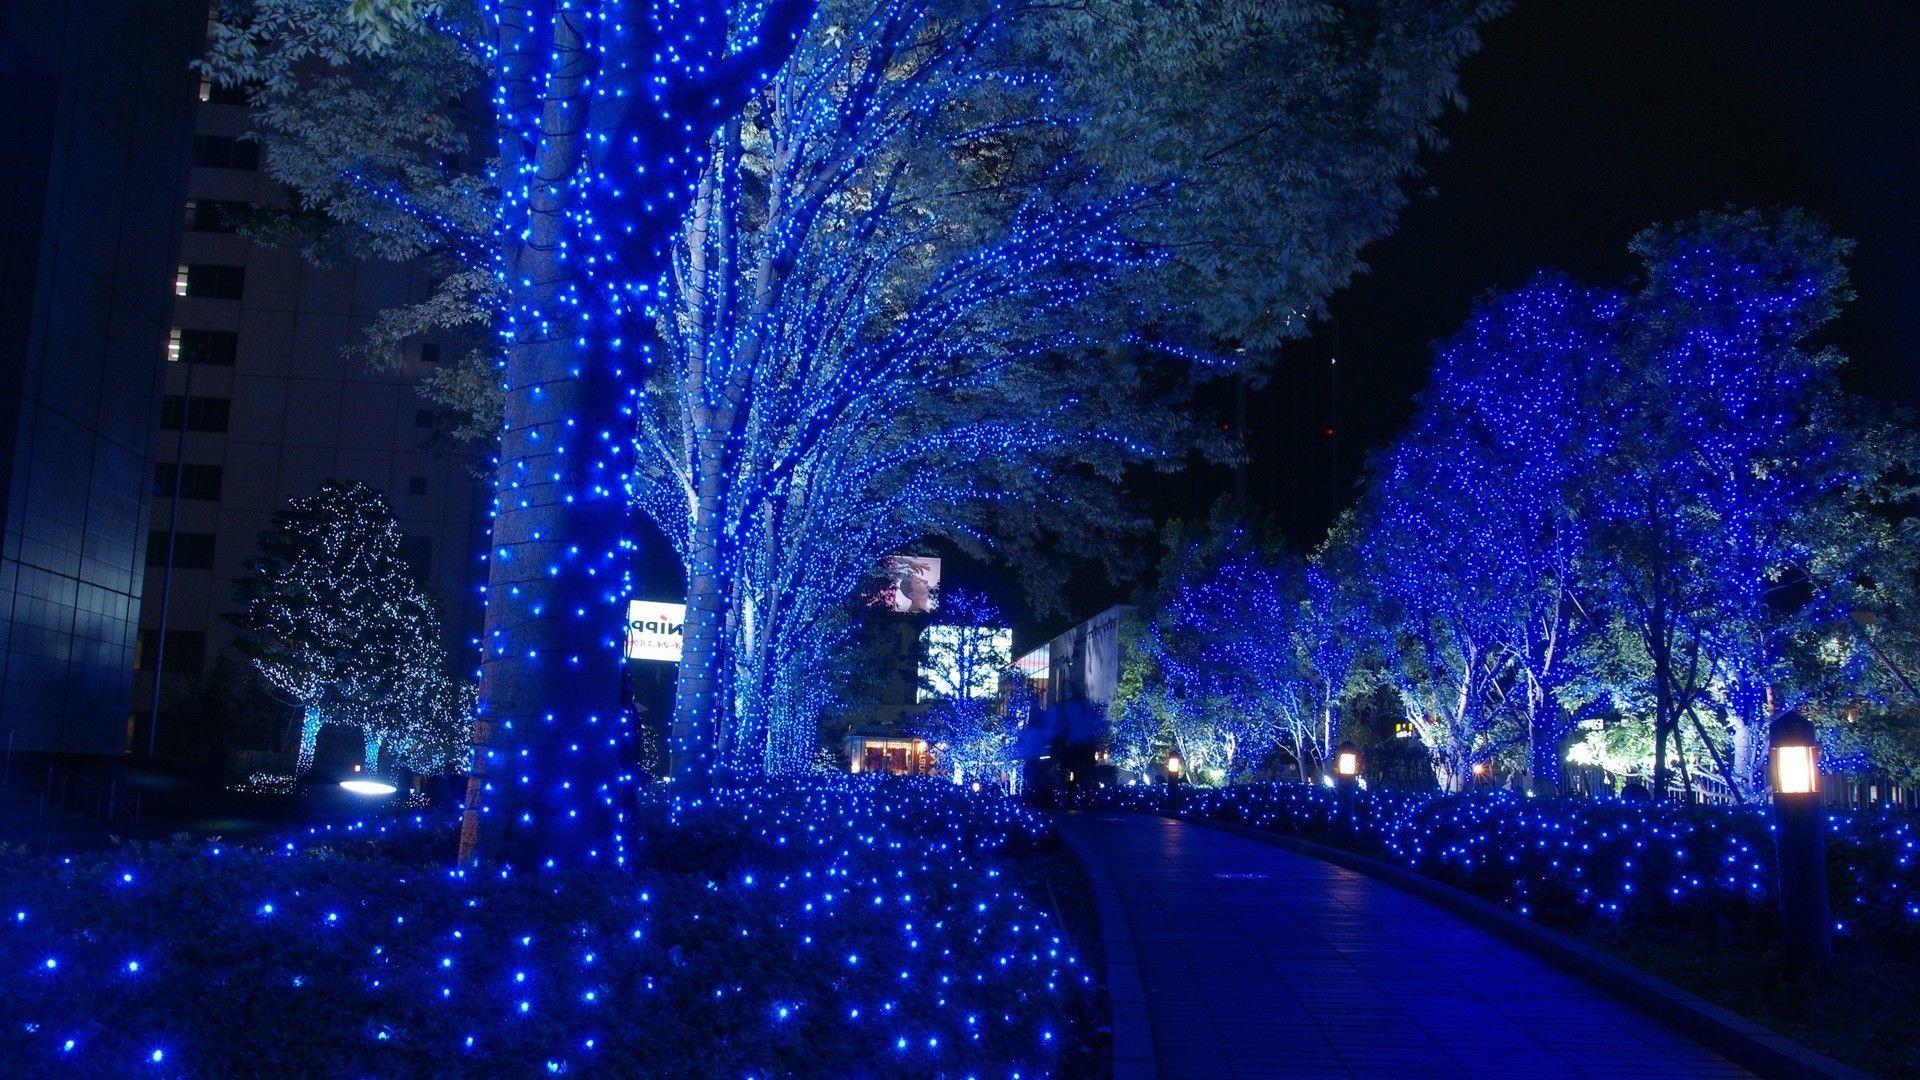 100 Holiday Lights Desktop Wallpaper Hd Wallpapers: HD Christmas Lights Wallpaper (67+ Images